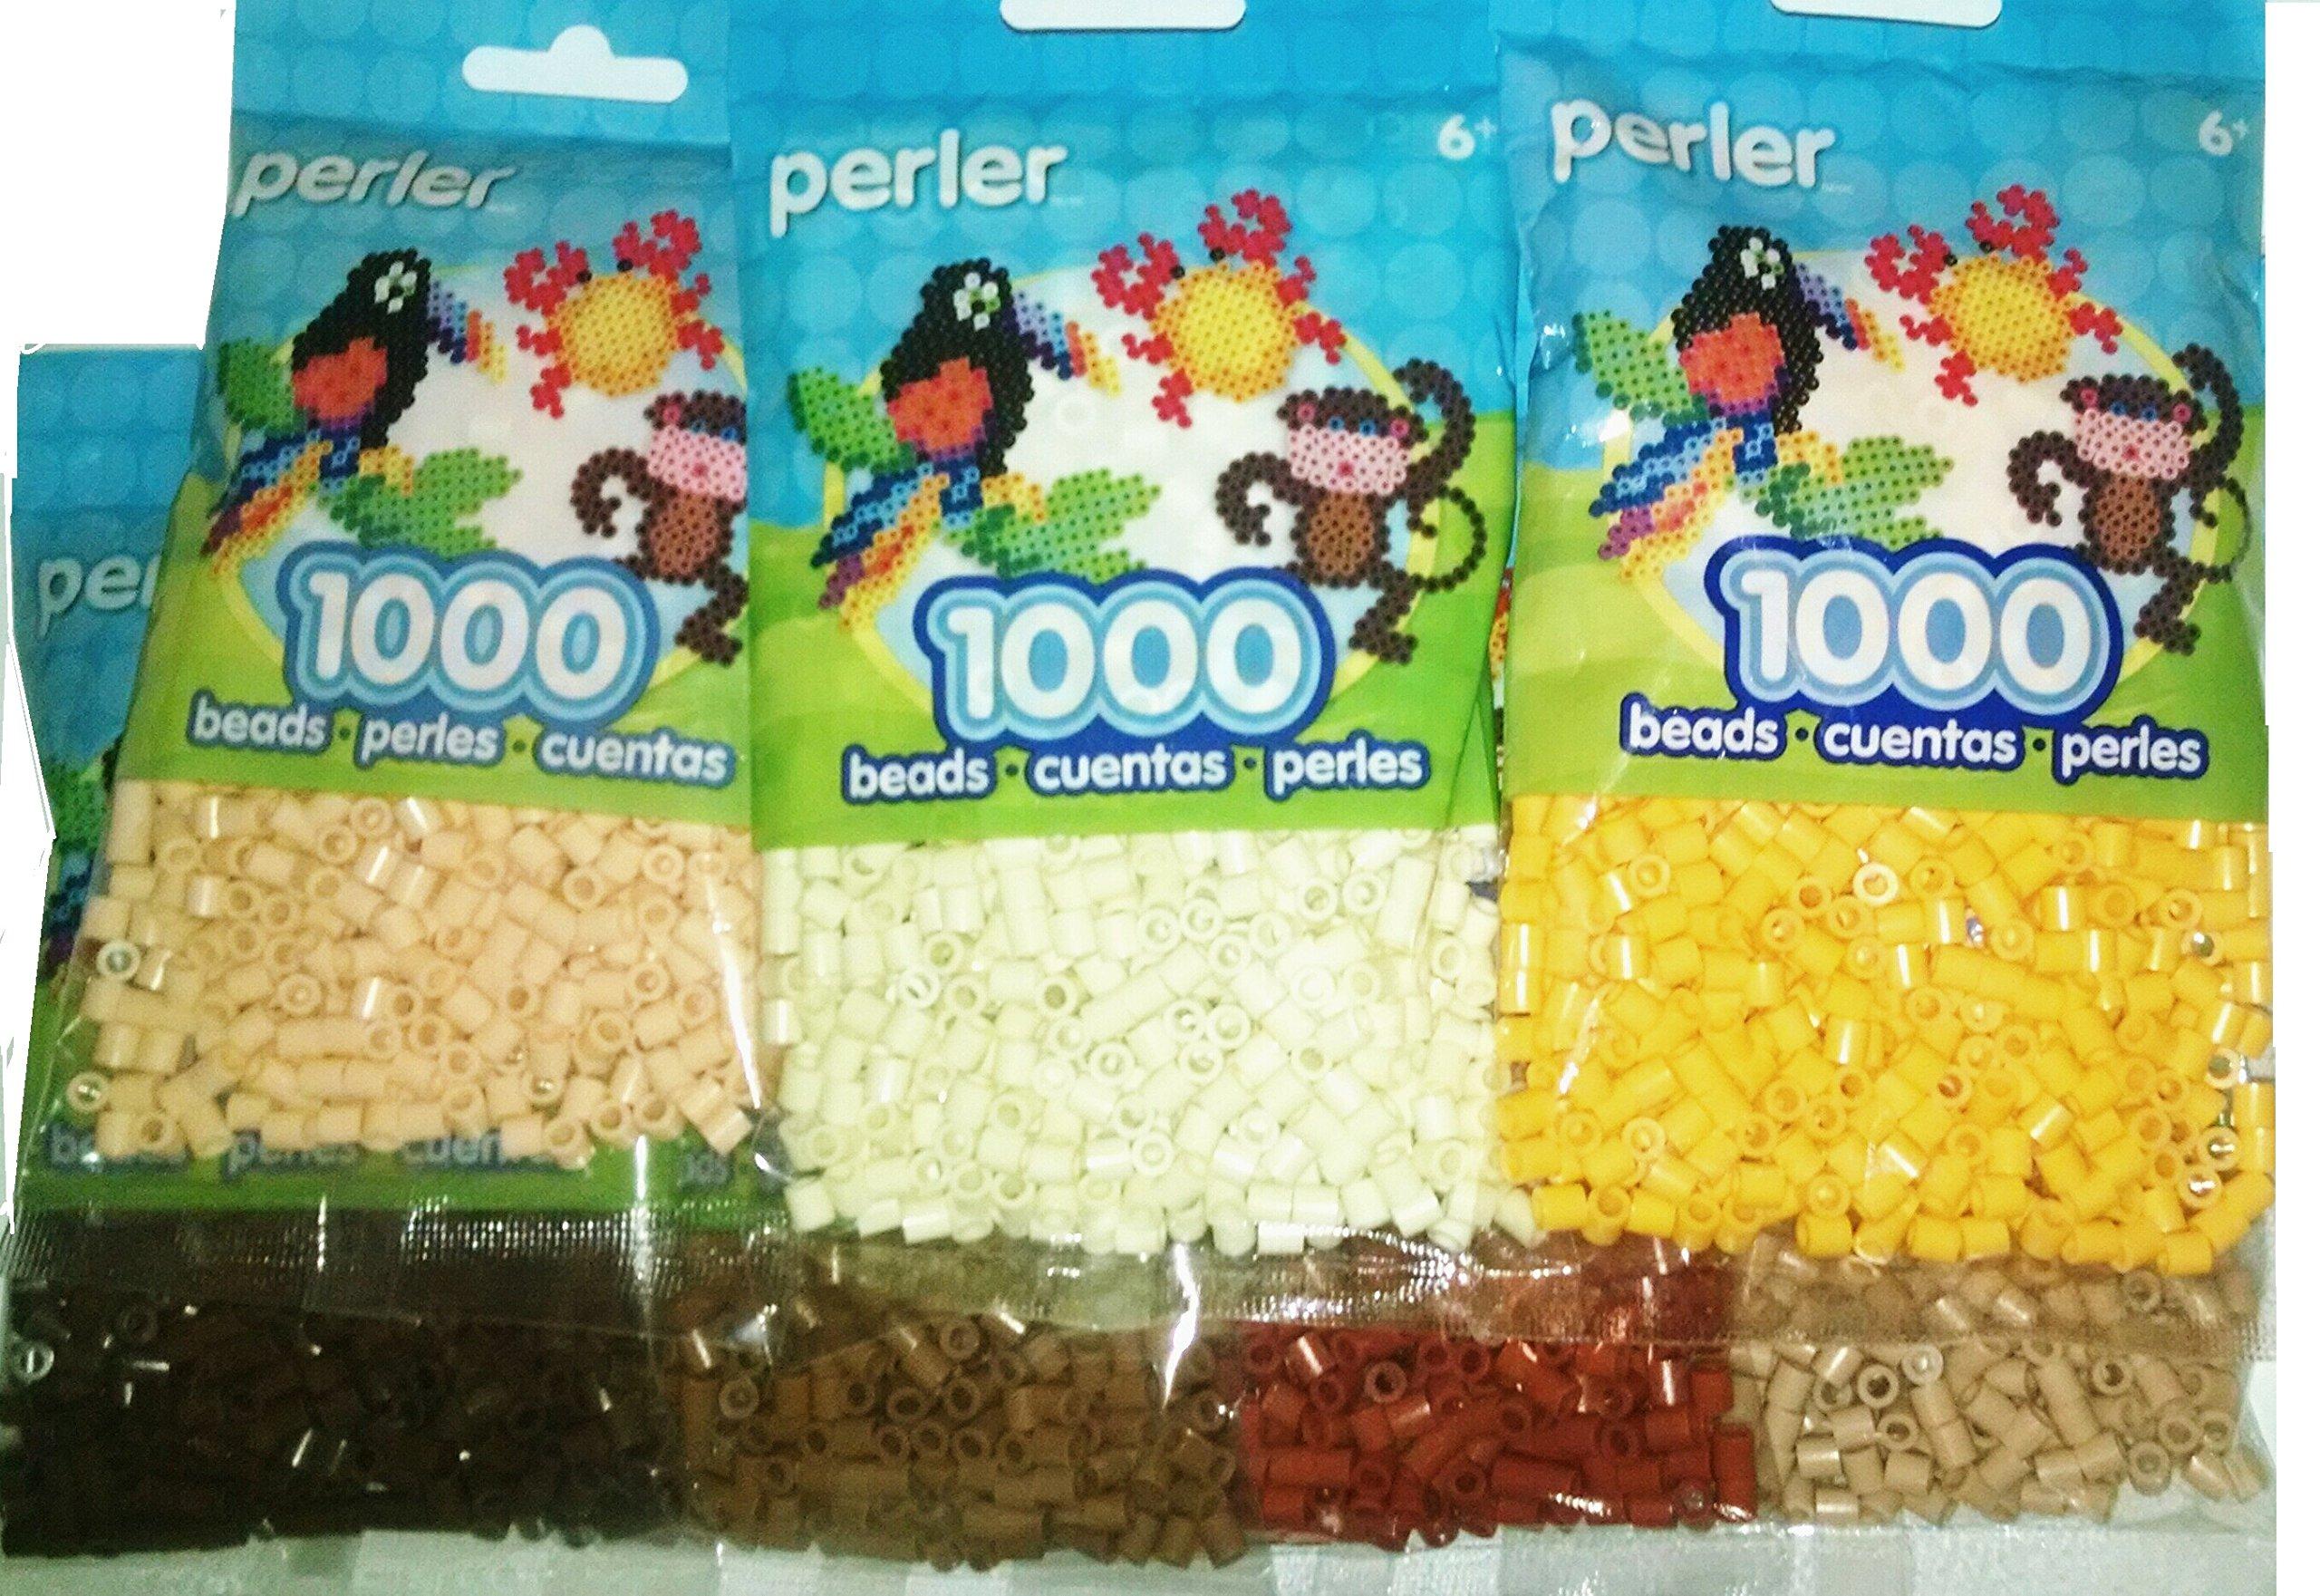 Perler Bead Bag, 7 Brown Group (Brown, Light Brown, Tan, Rust, Sand, Cheddar, Cream) by Perler